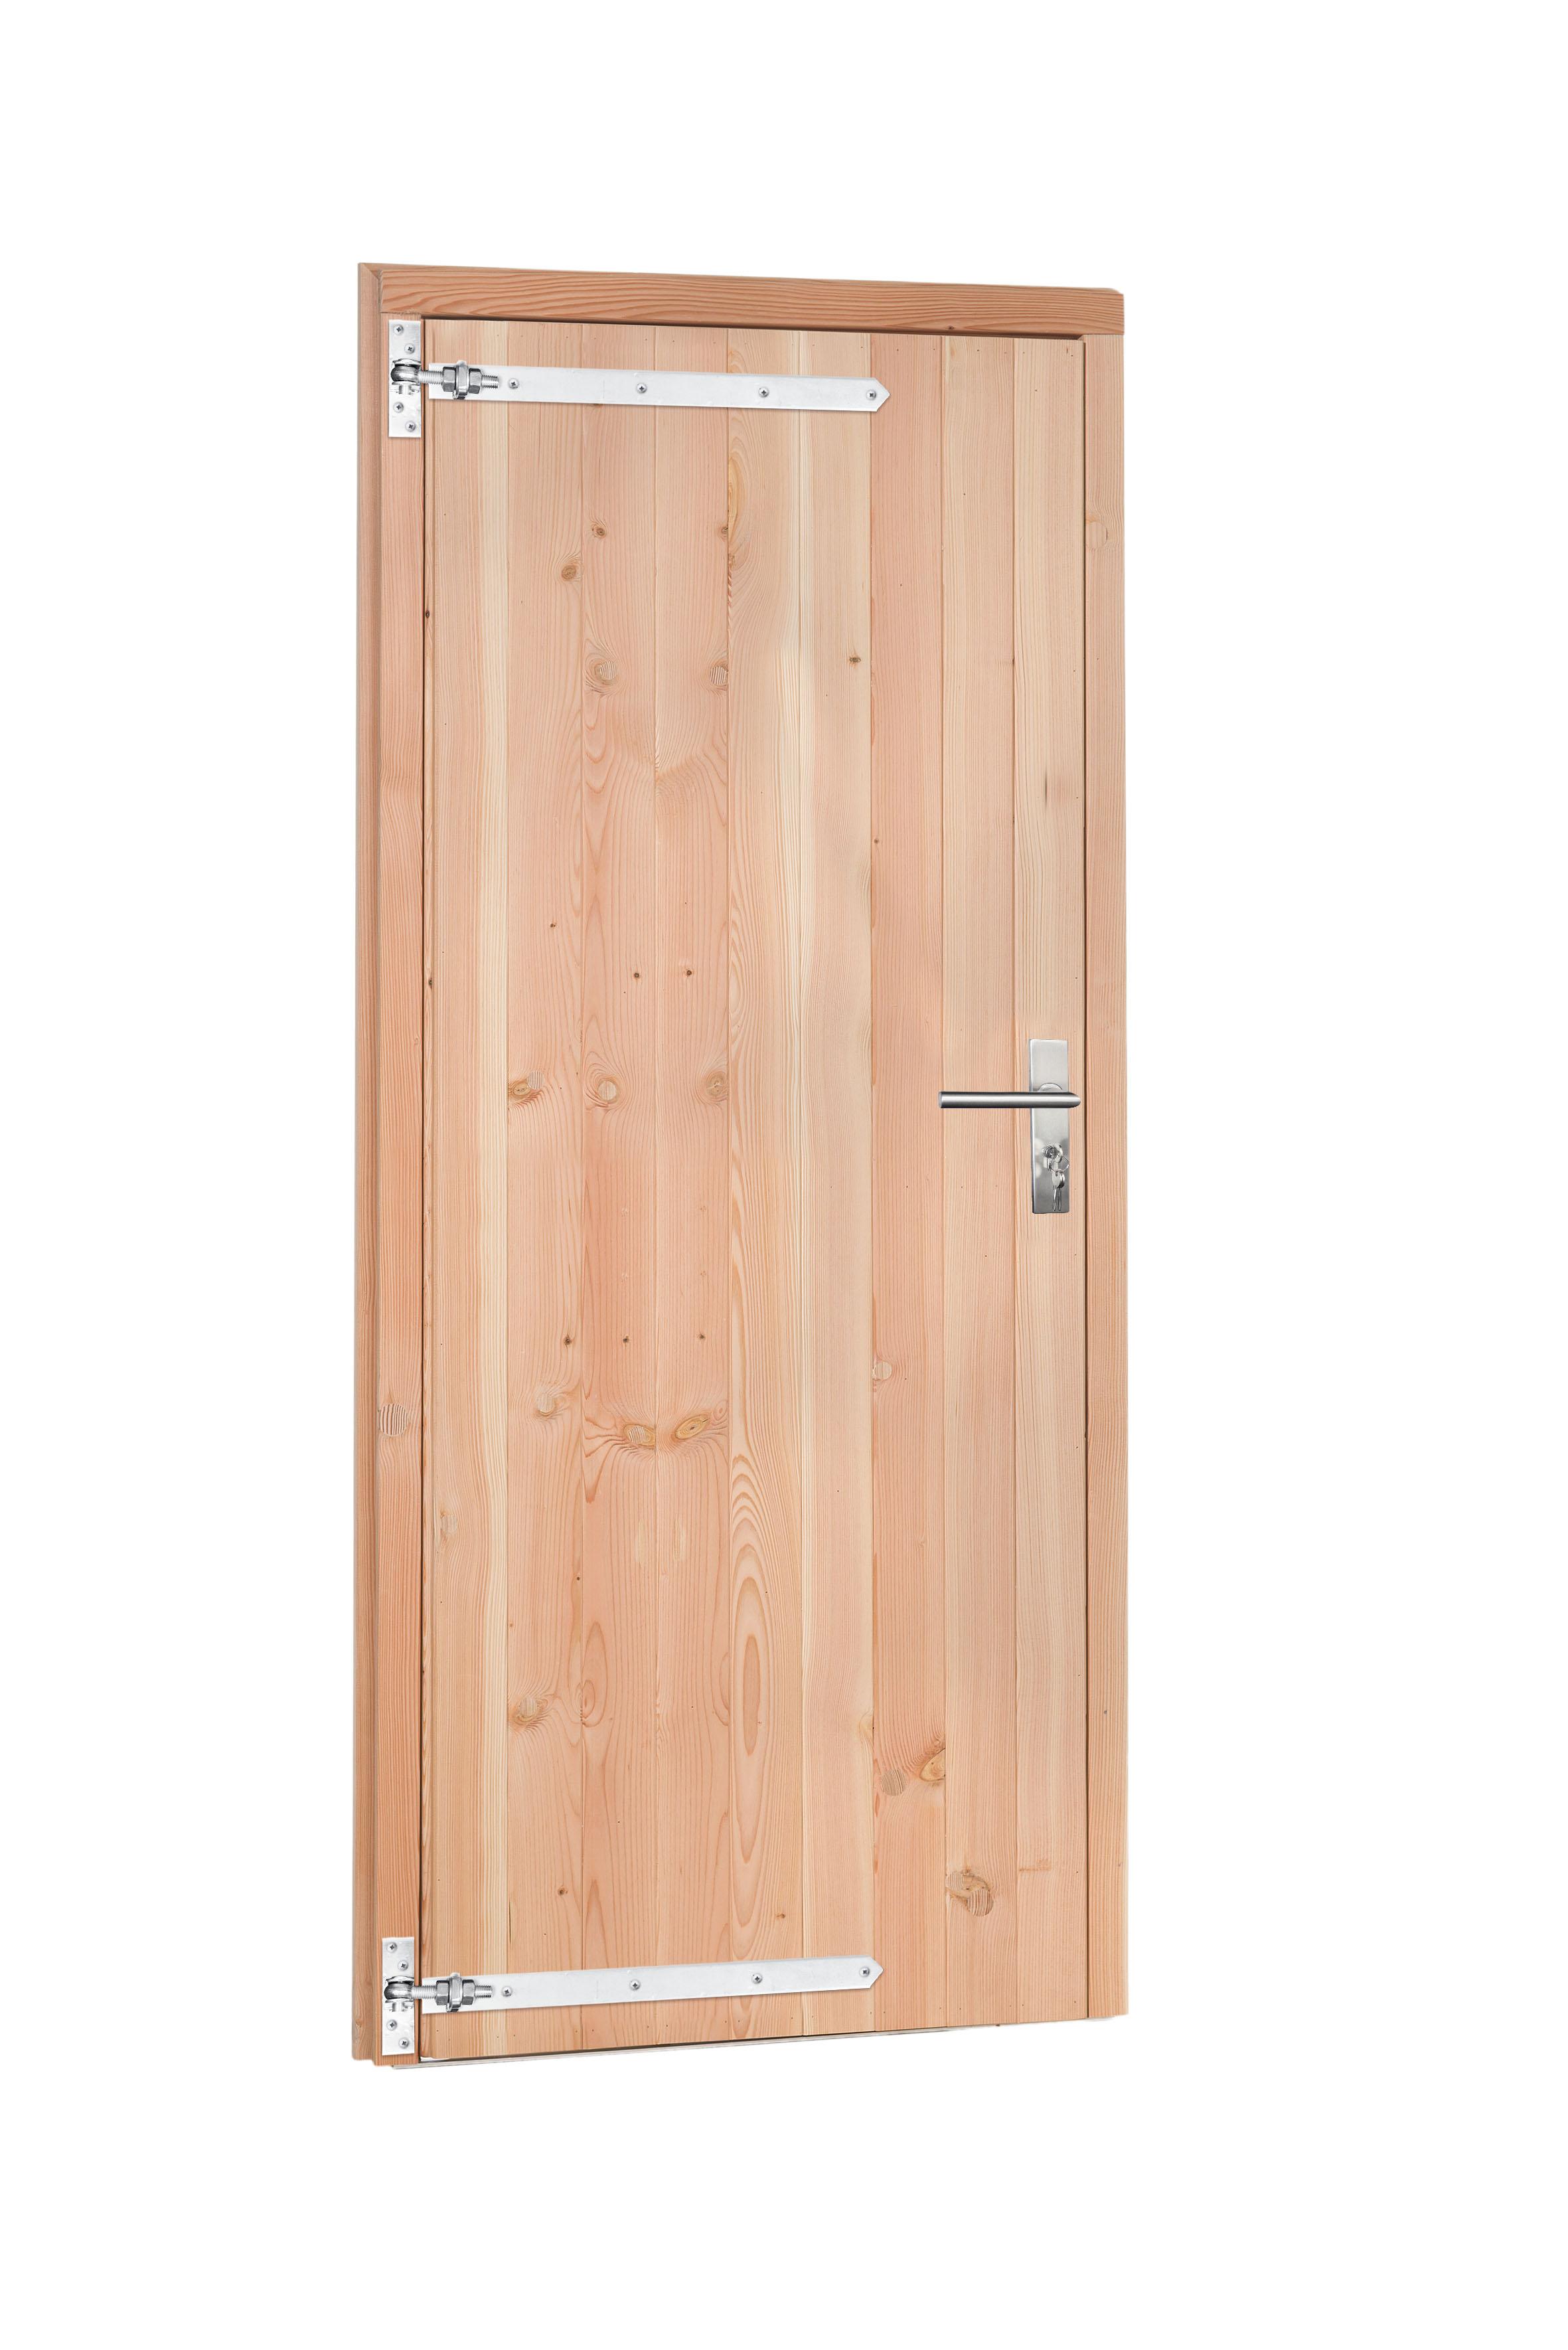 Woodvision | Douglas enkele deur | Dicht | Groen geïmpregneerd | Rechtsdraaiend